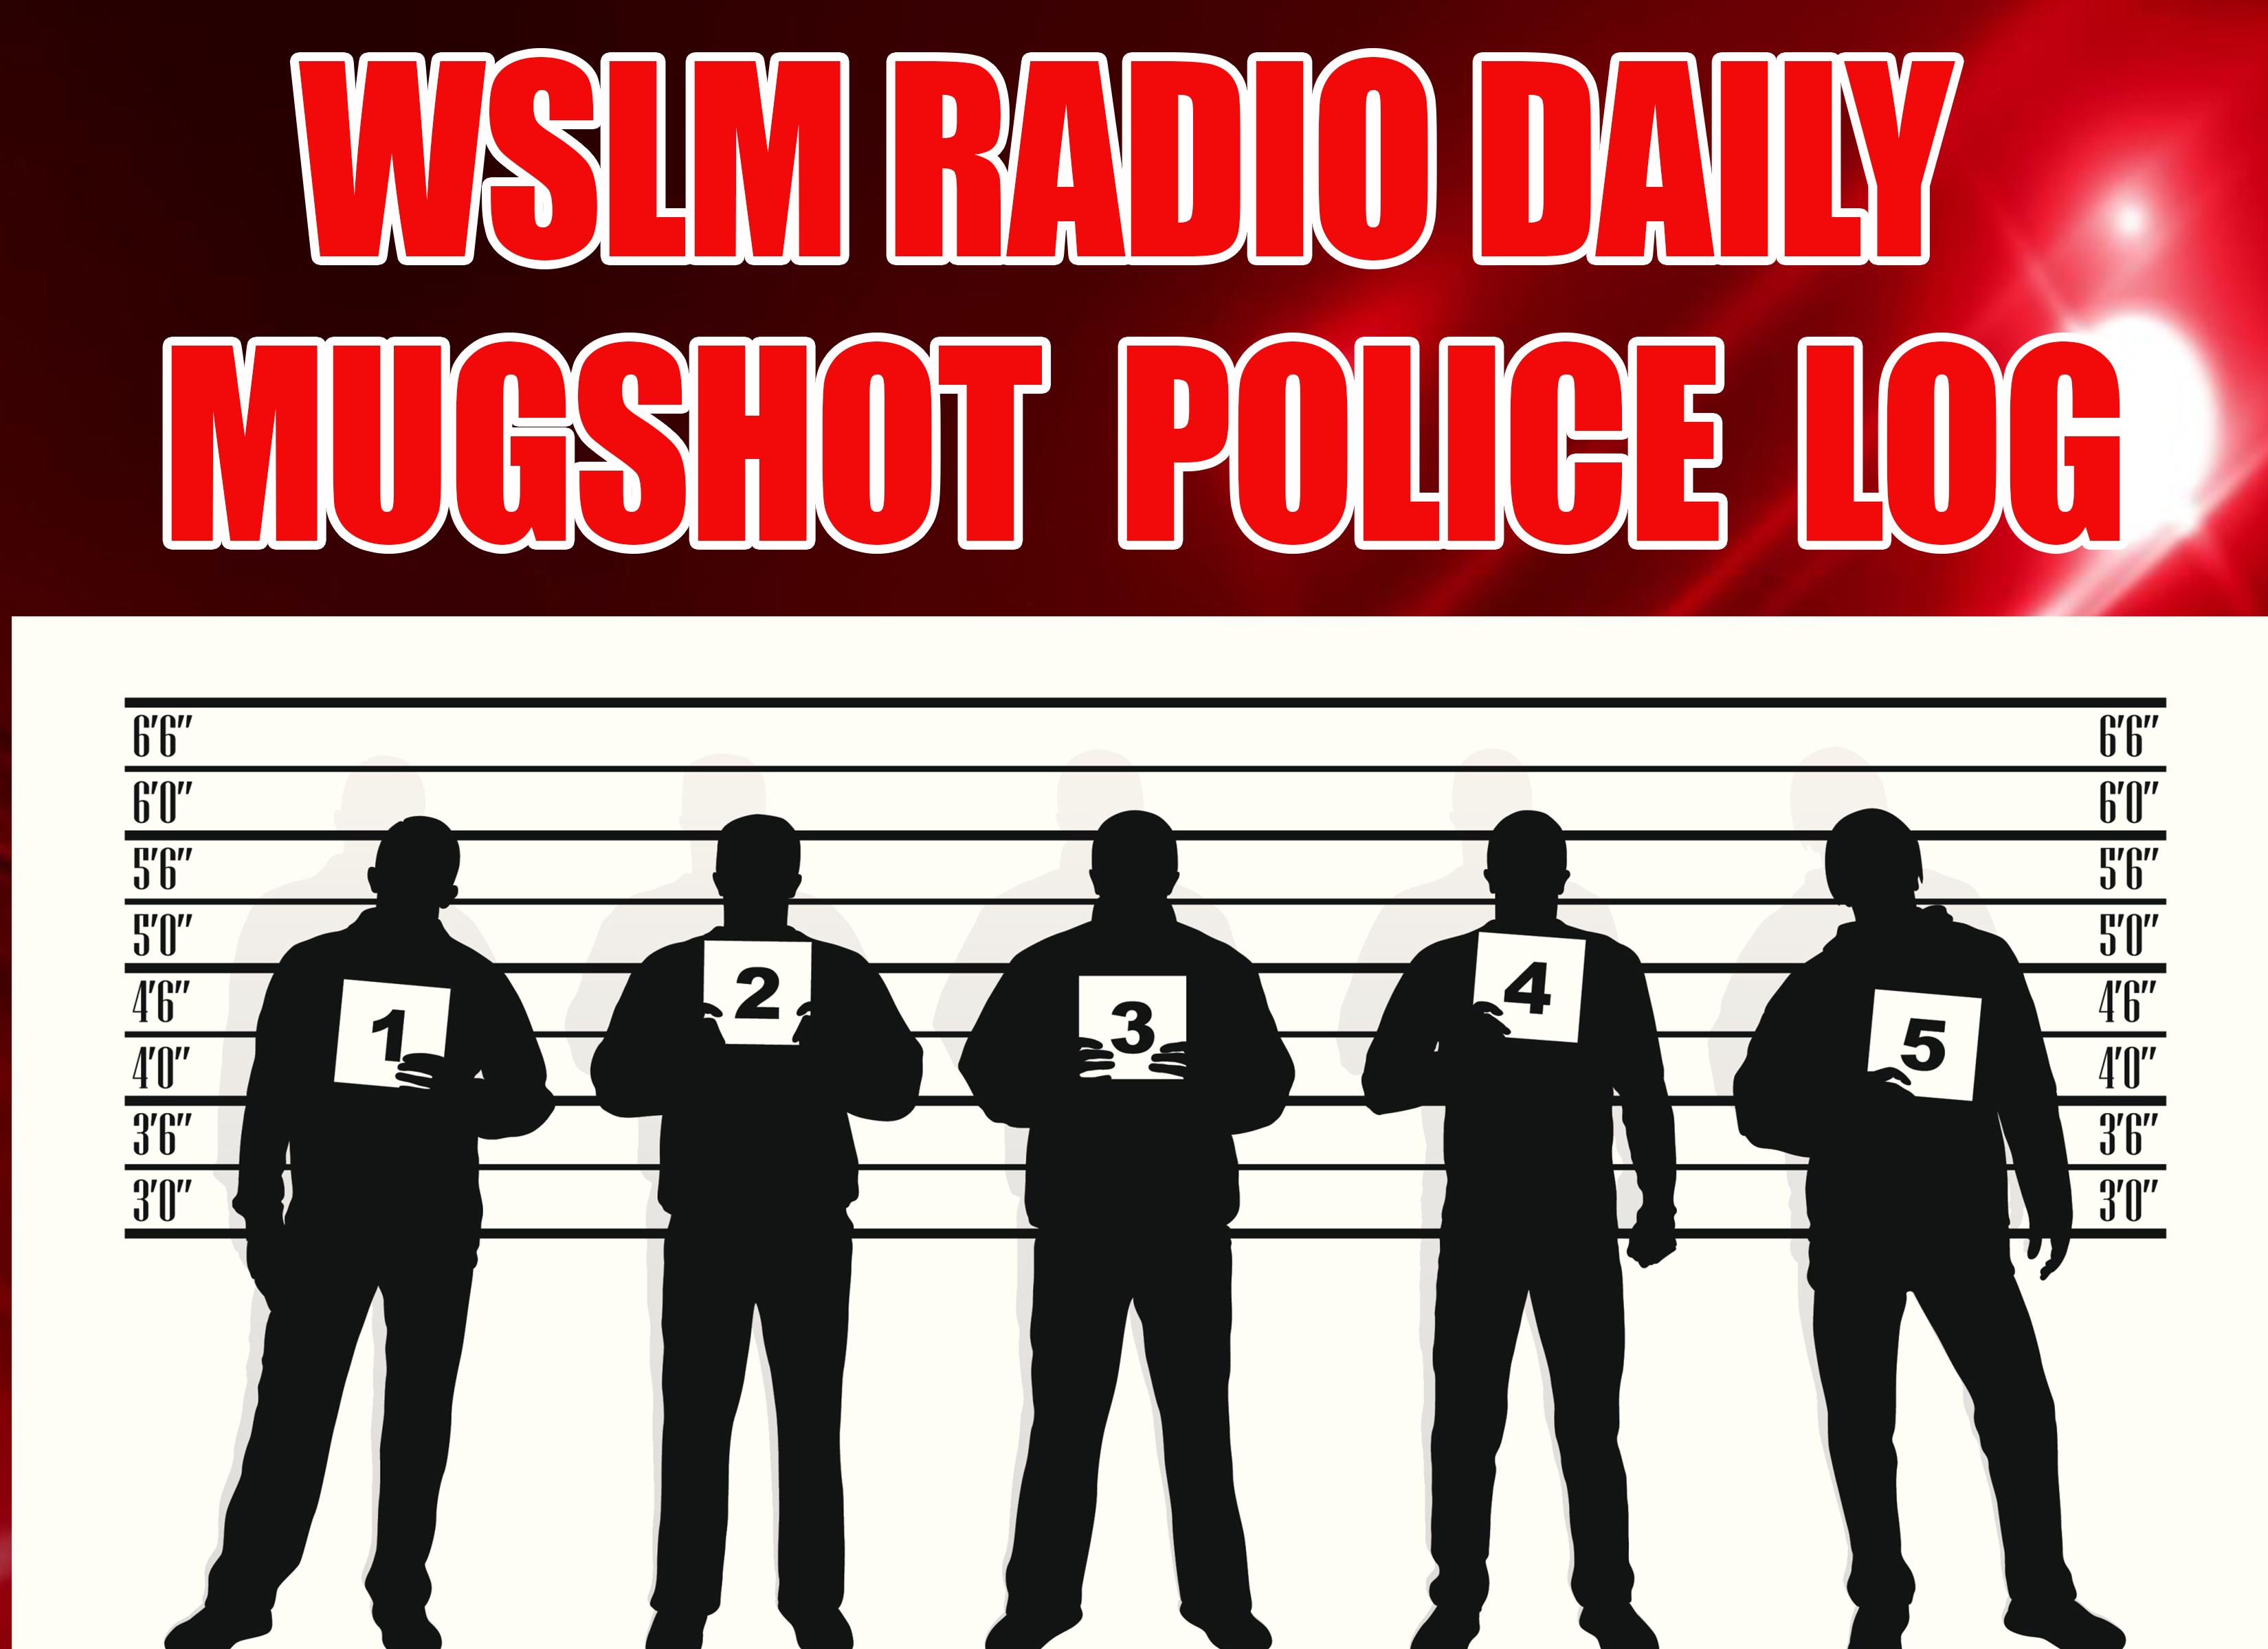 washington county inmate roster – 11-2-18 | wslm radio